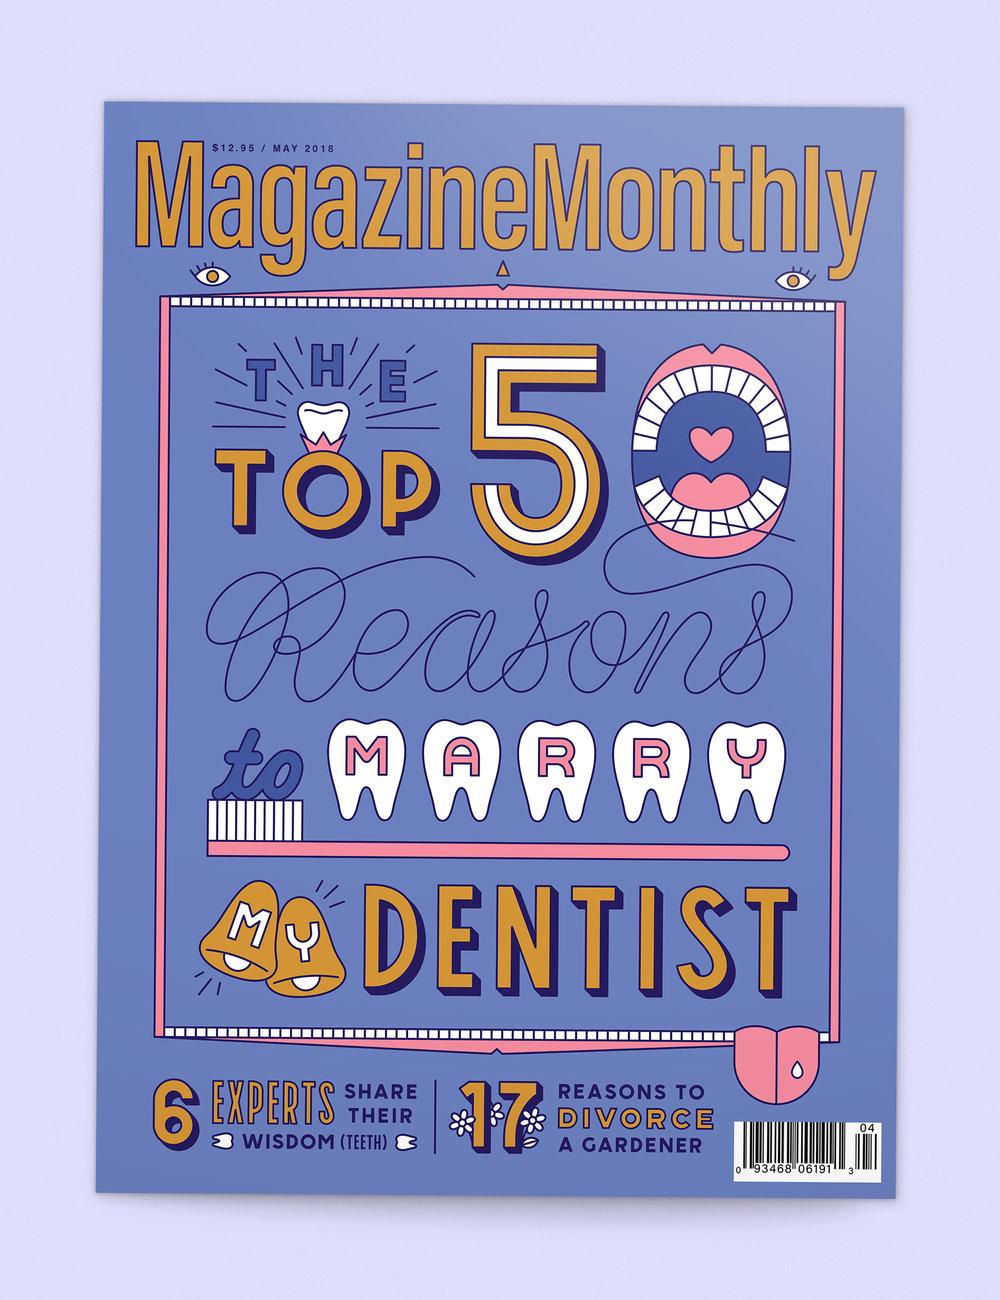 5 dentist.jpg